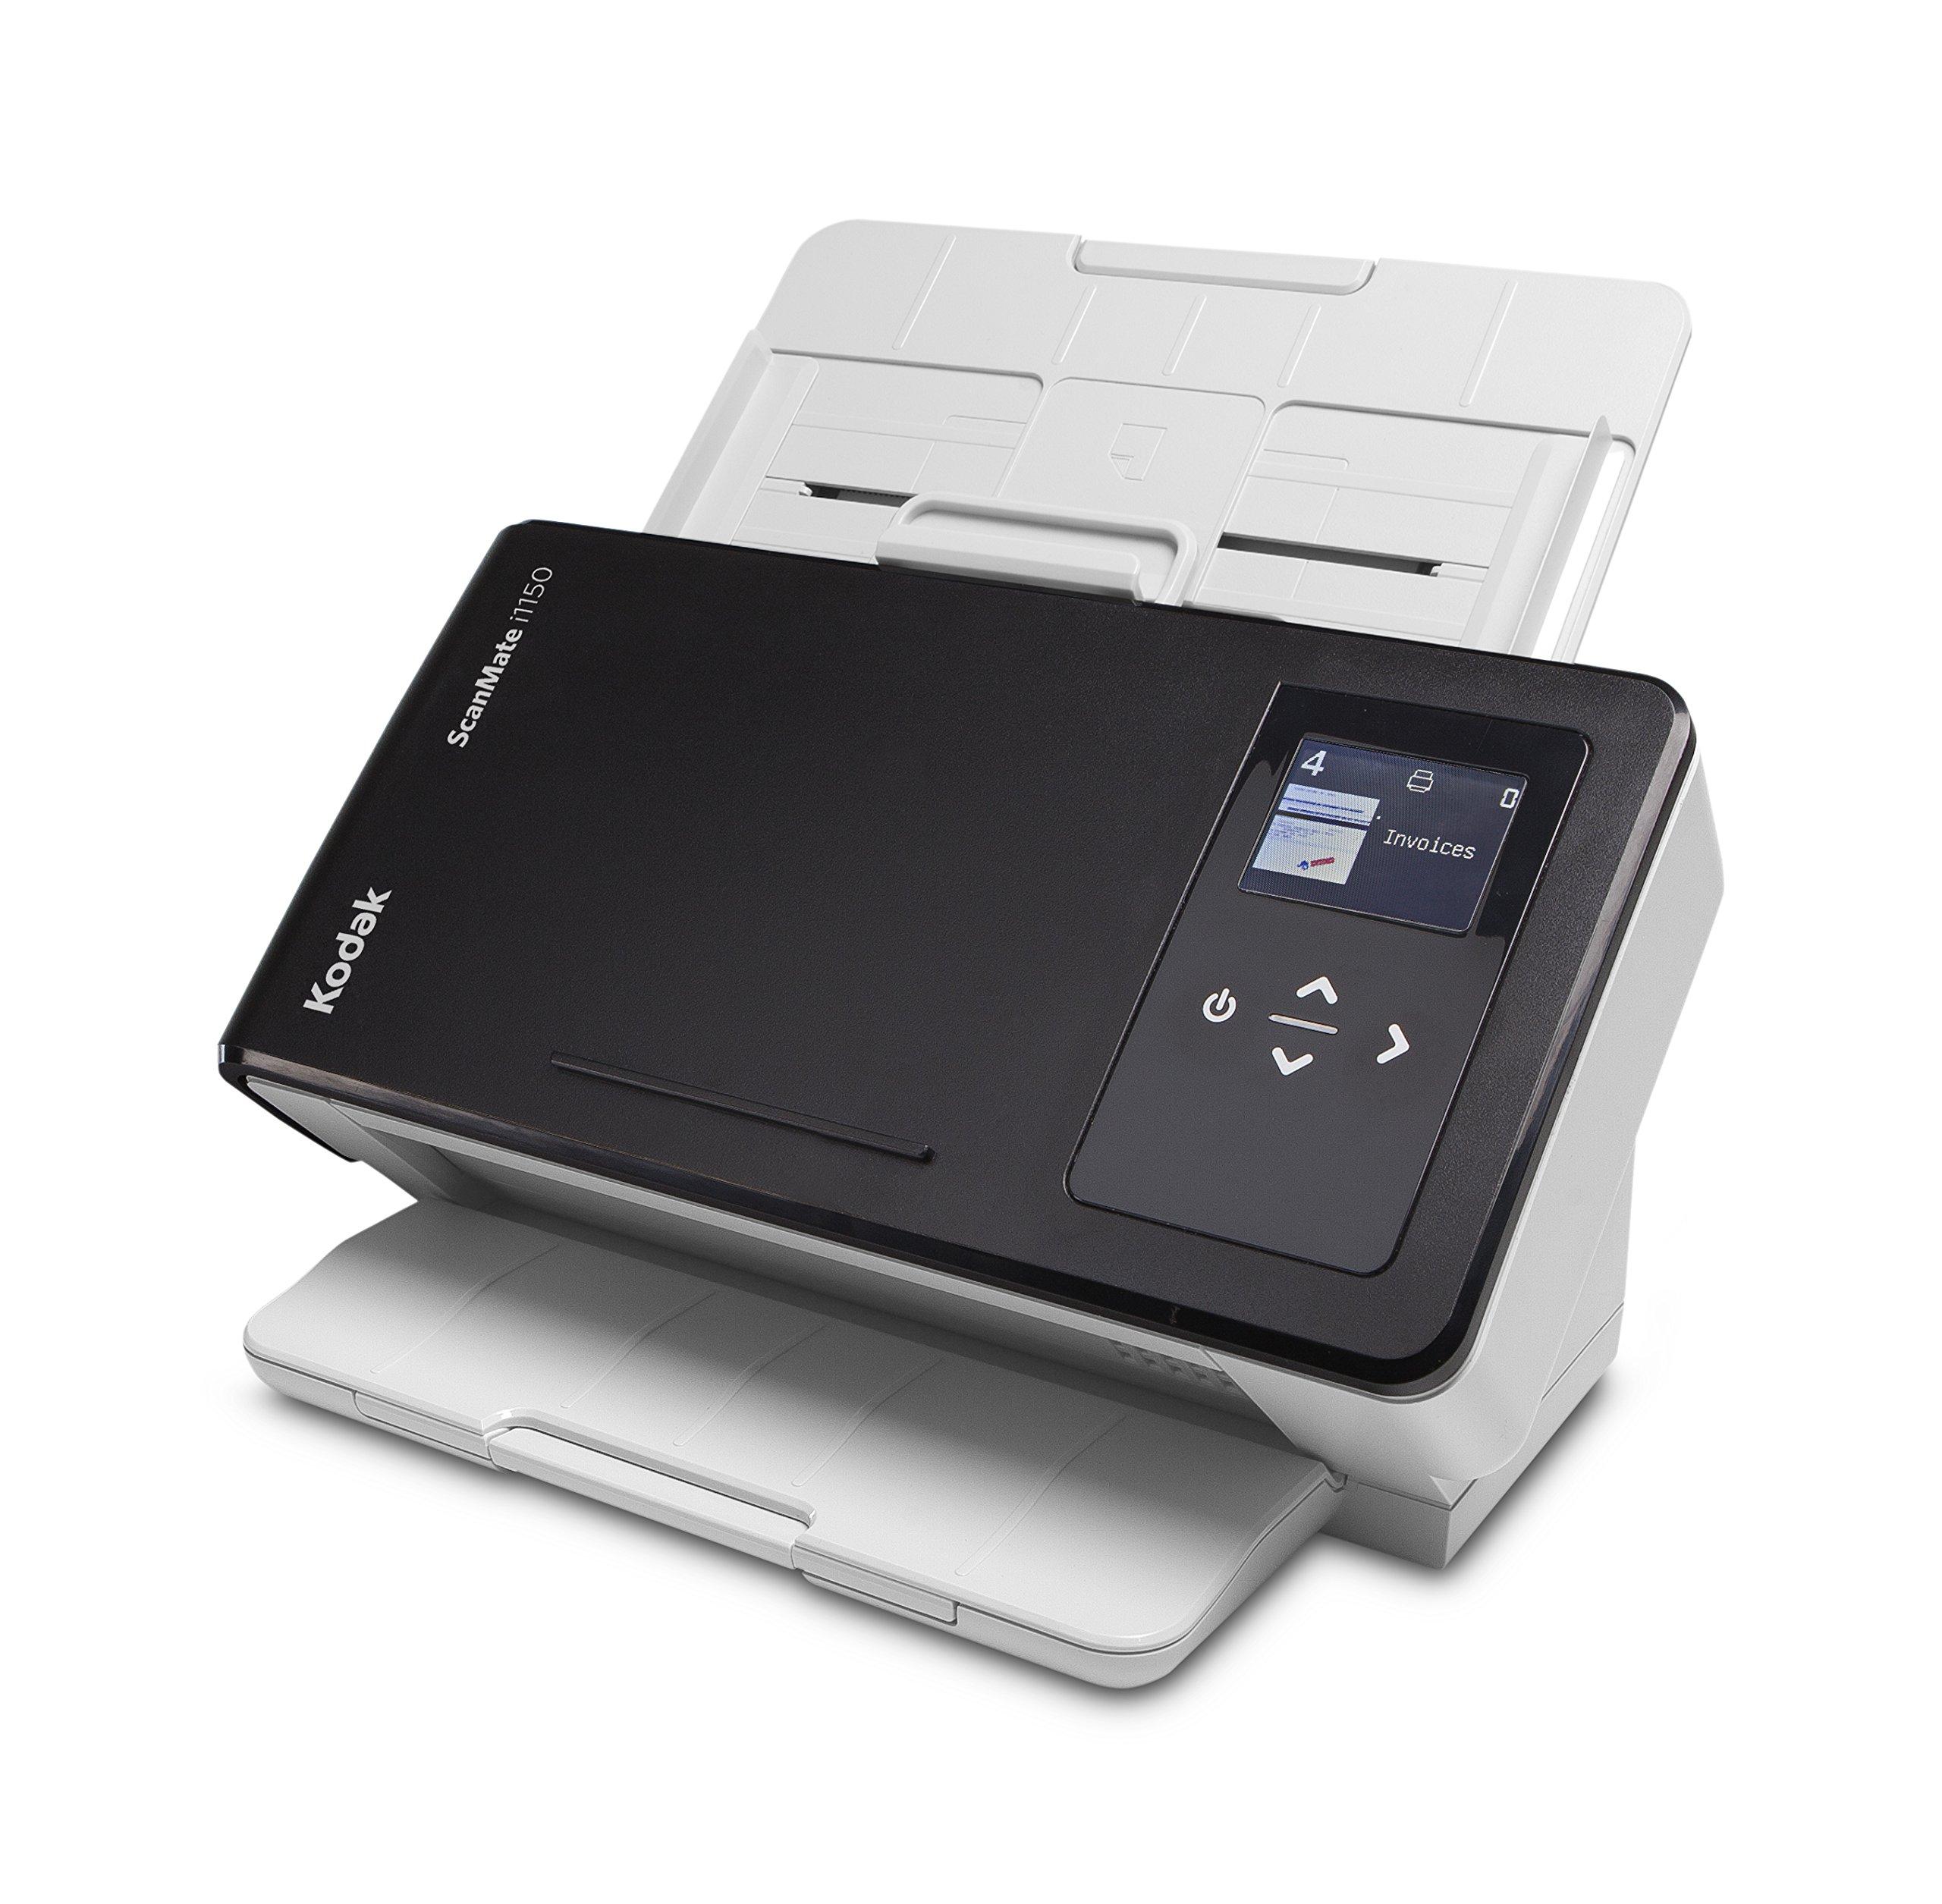 Kodak Scanmate i1150 1664390 Document Scanner by Kodak